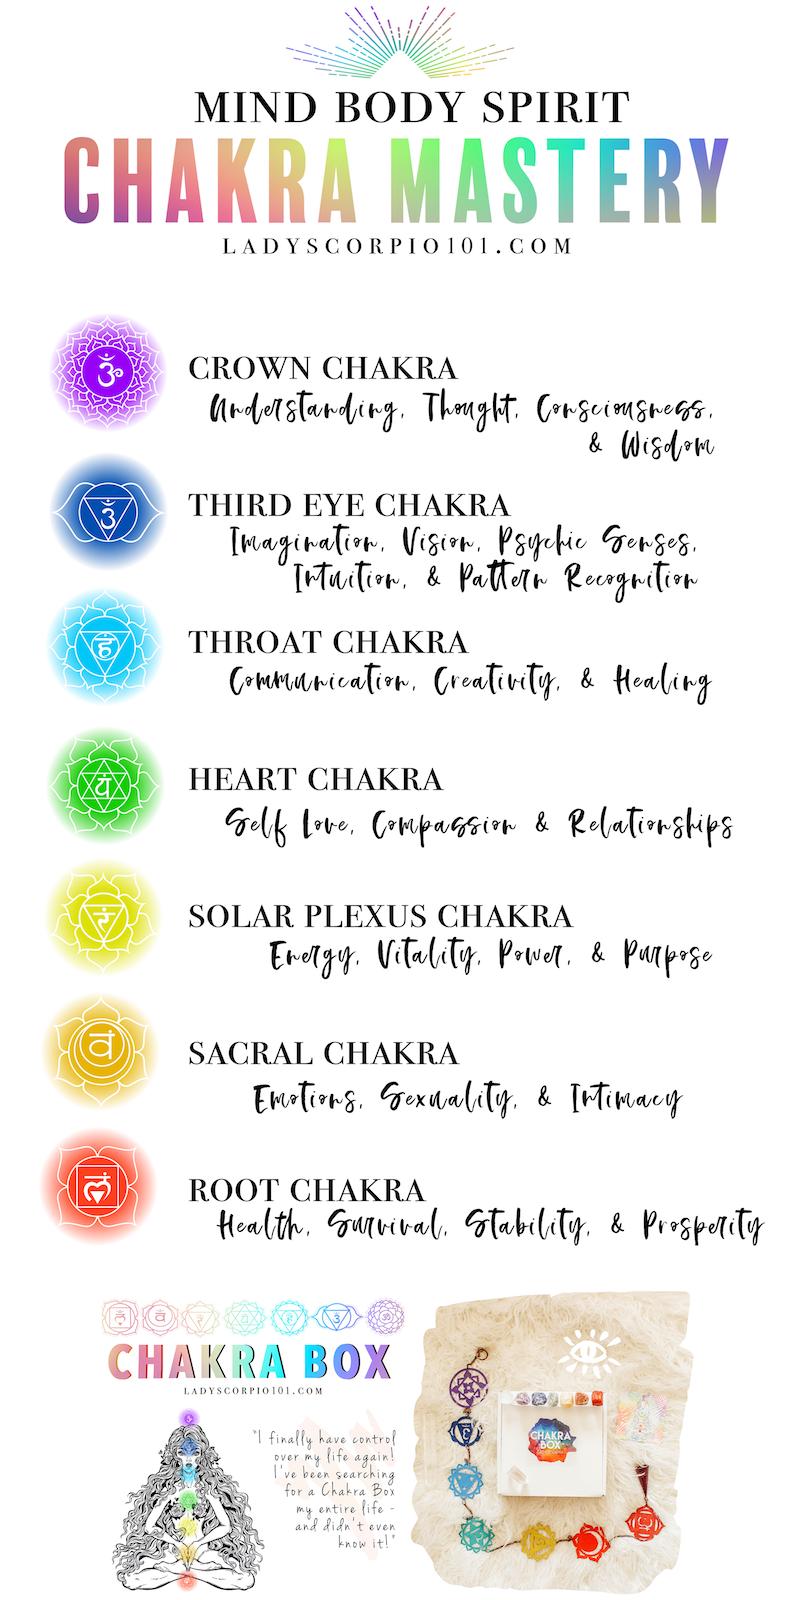 Ladyscorpio101 Alexa Halladay Ladyscorpio101 Com Align Your 7 Chakras With All Of My Energy Healing Products Th Chakra Chakra Healing Energy Healing